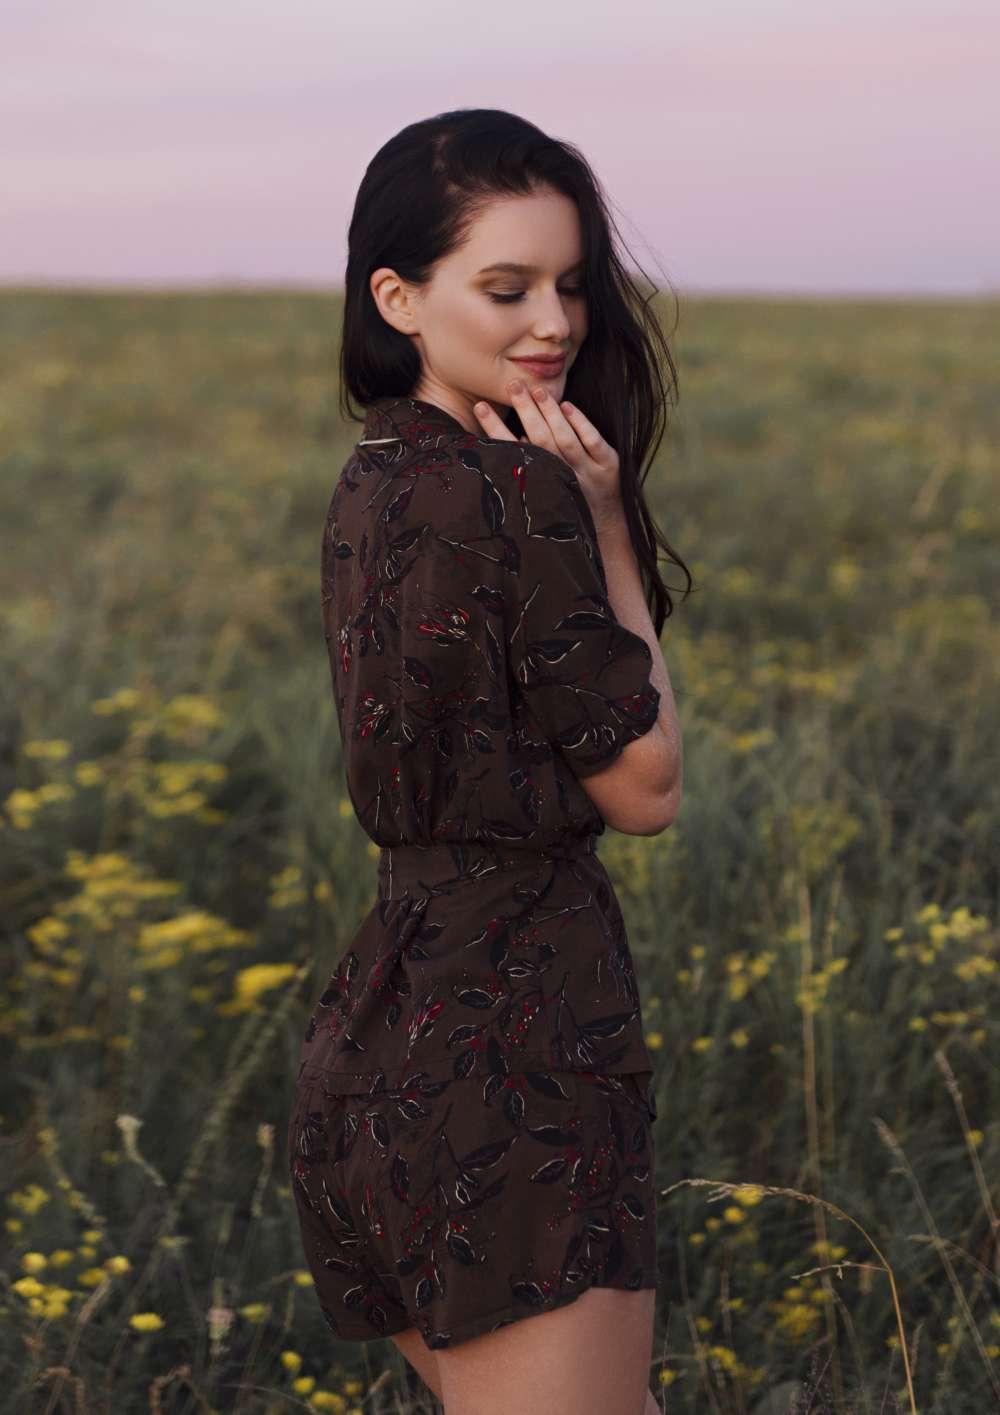 natural fabric Loungewear organic linen cotton Cranberry dessert your musa pants and long sleeve kimono la musa chic outfit